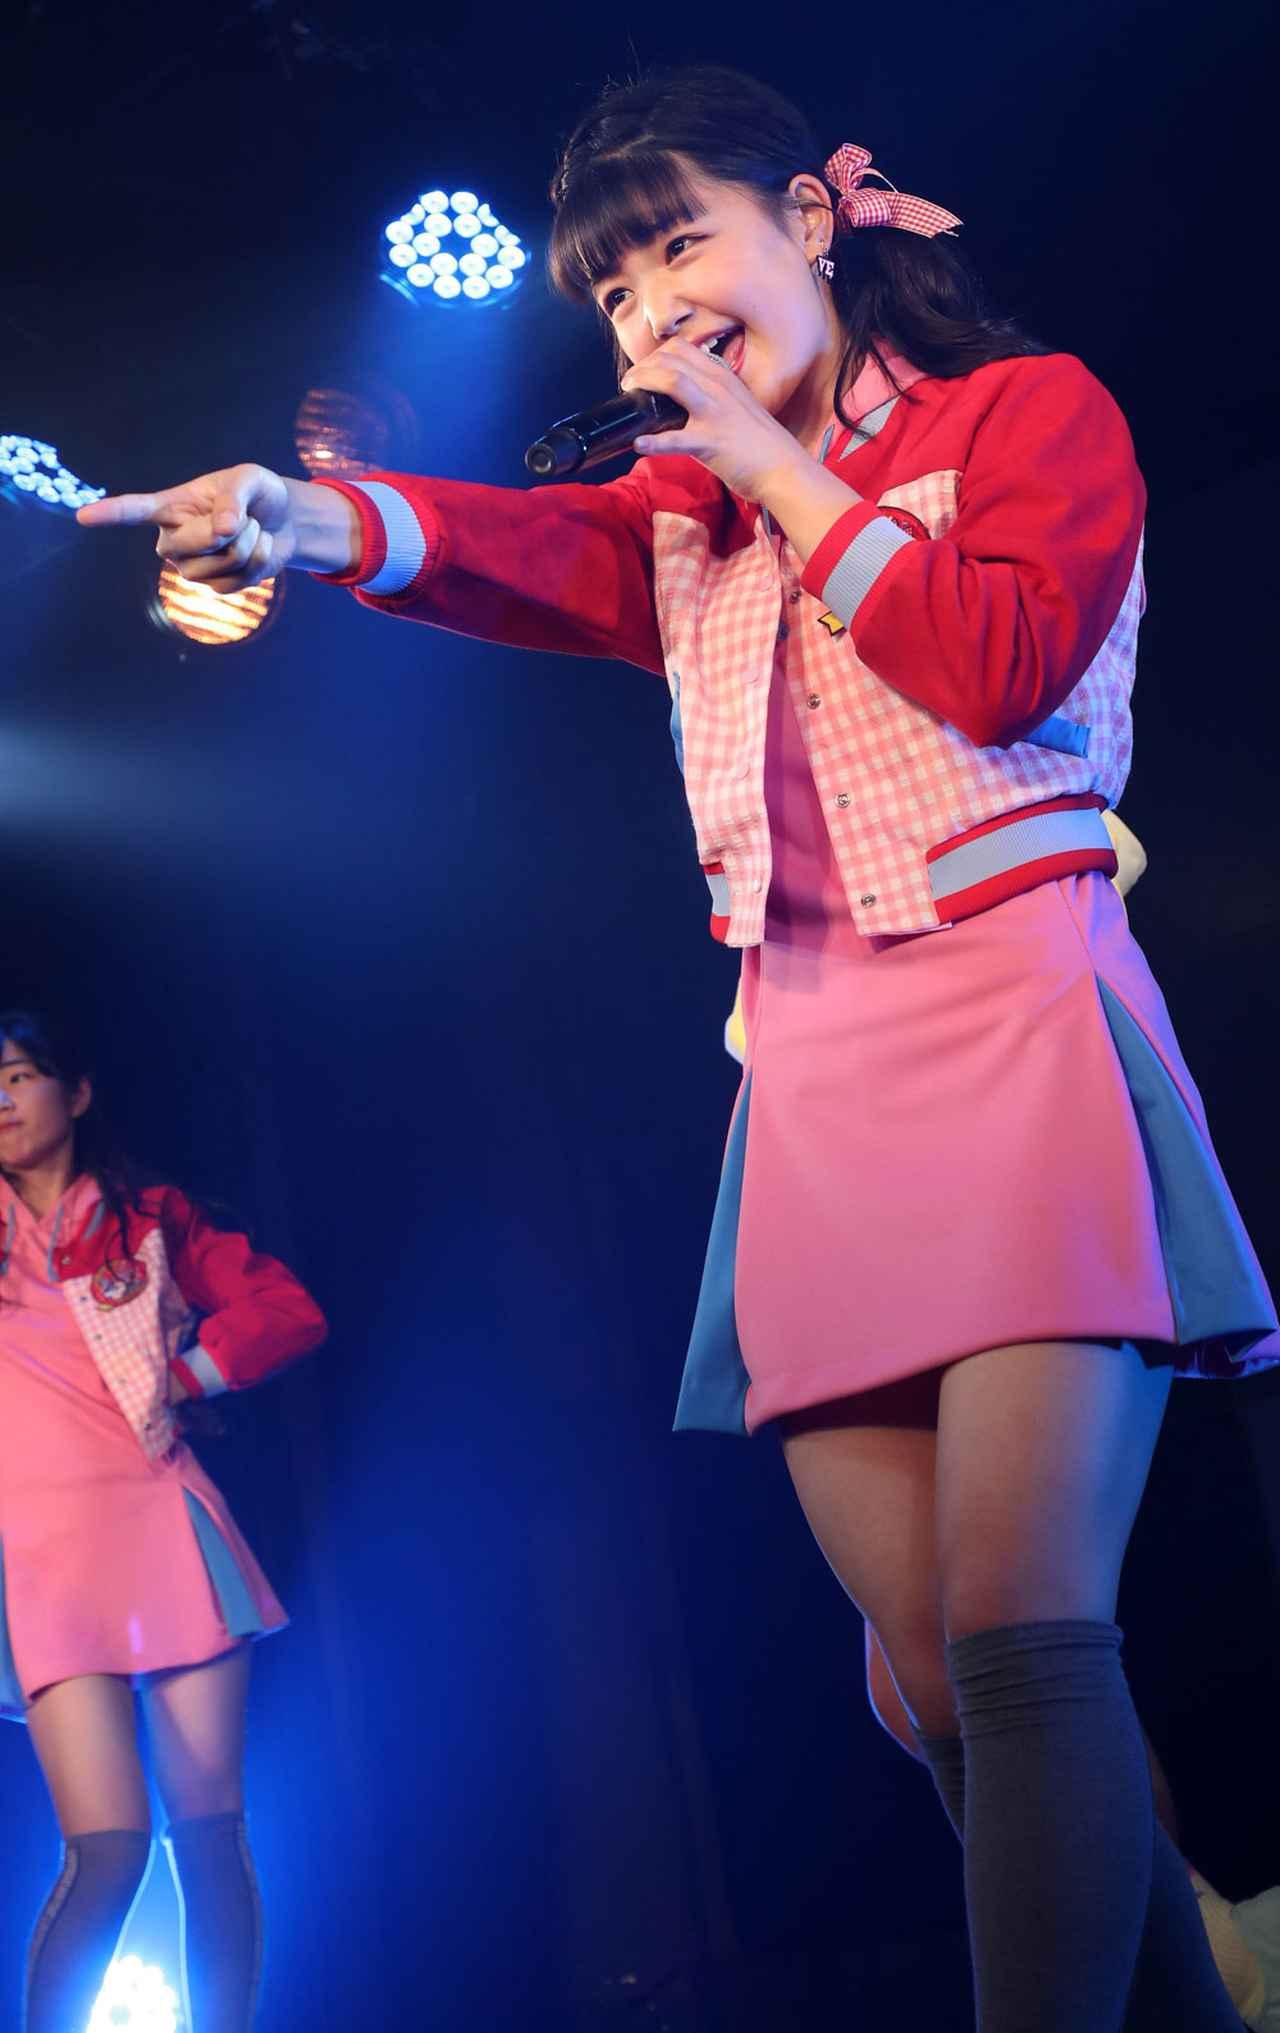 Images : 33番目の画像 - 「ハコイリムスメ/依田彩花、山本花奈を新メンバーに迎え、第5期発足。ロックンロール調の新オリジナル曲「キス取りゲーム」も披露」のアルバム - Stereo Sound ONLINE